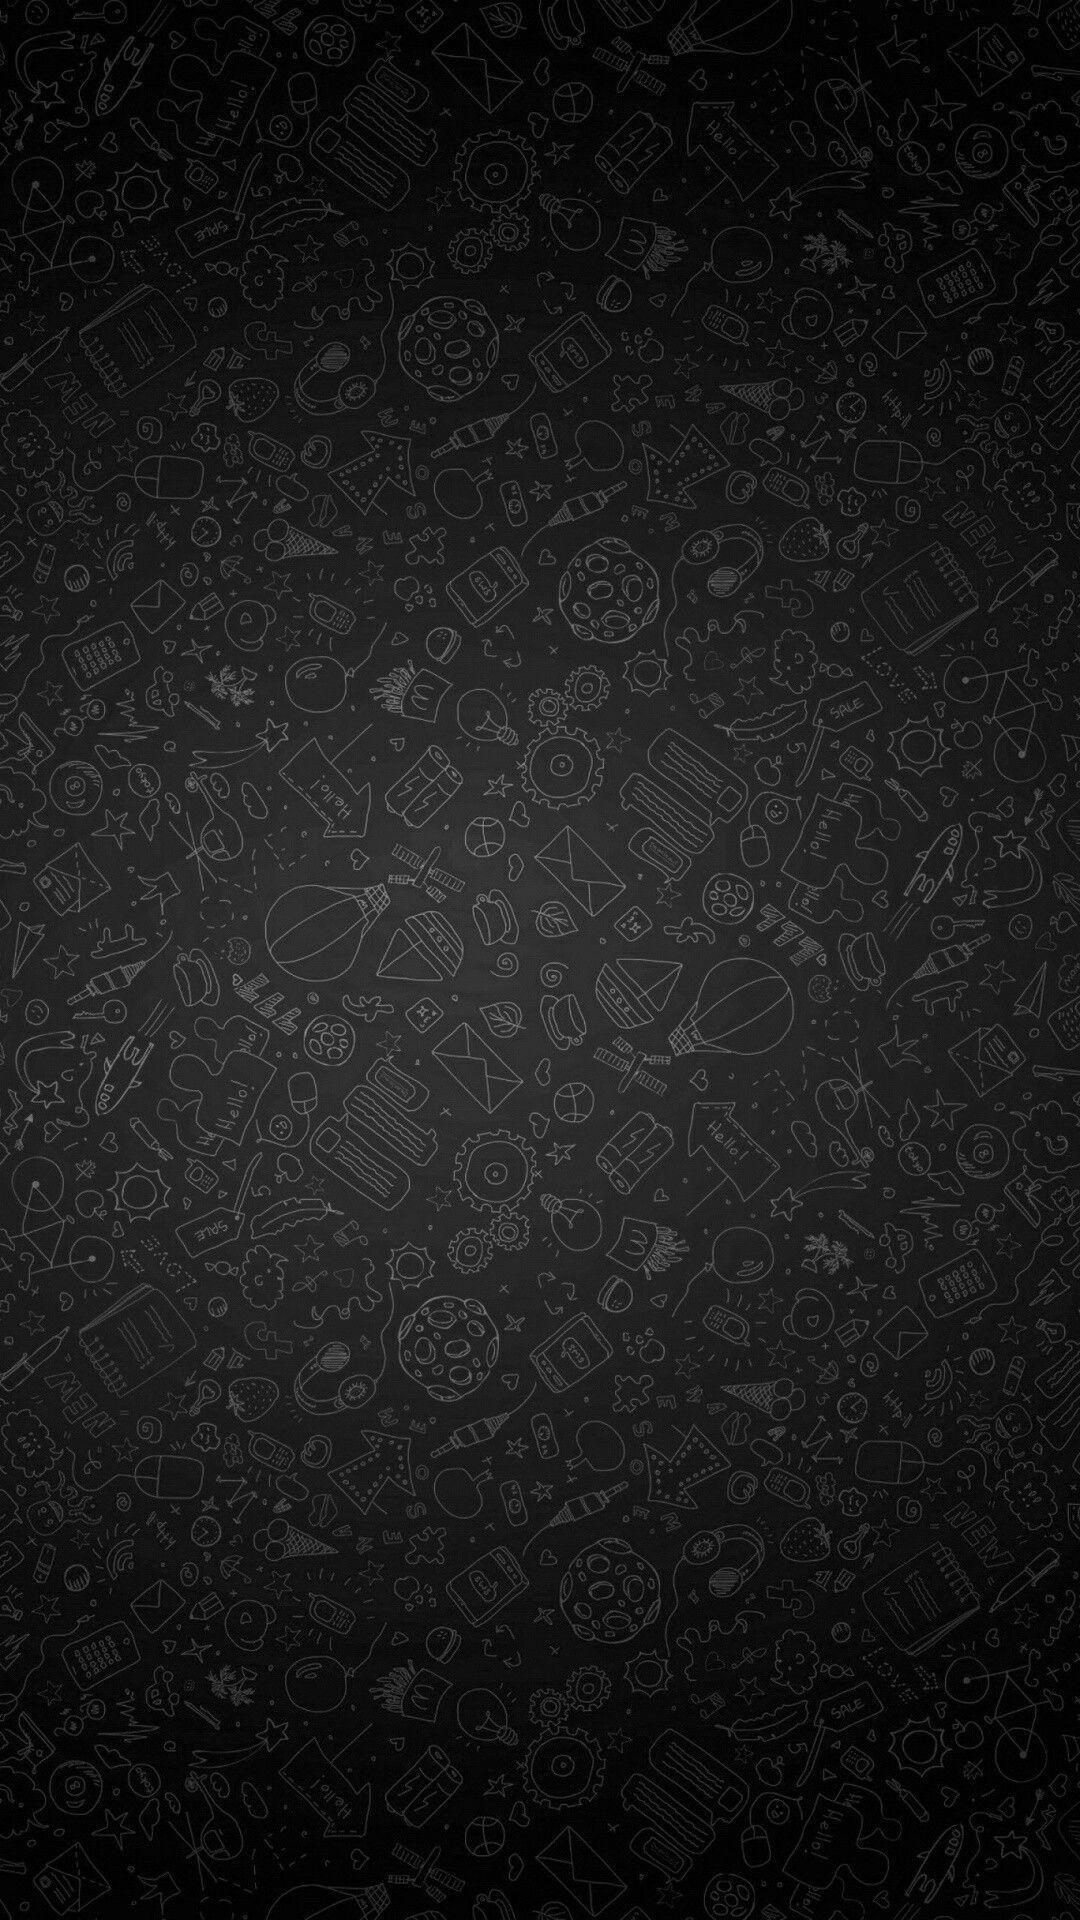 Black Wallpaper Iphone Fullhdwallpaperiphone 521995413060255288 Wallpaper Iphone Hitam Wallpaper Hitam Wallpaper Ponsel Hitam